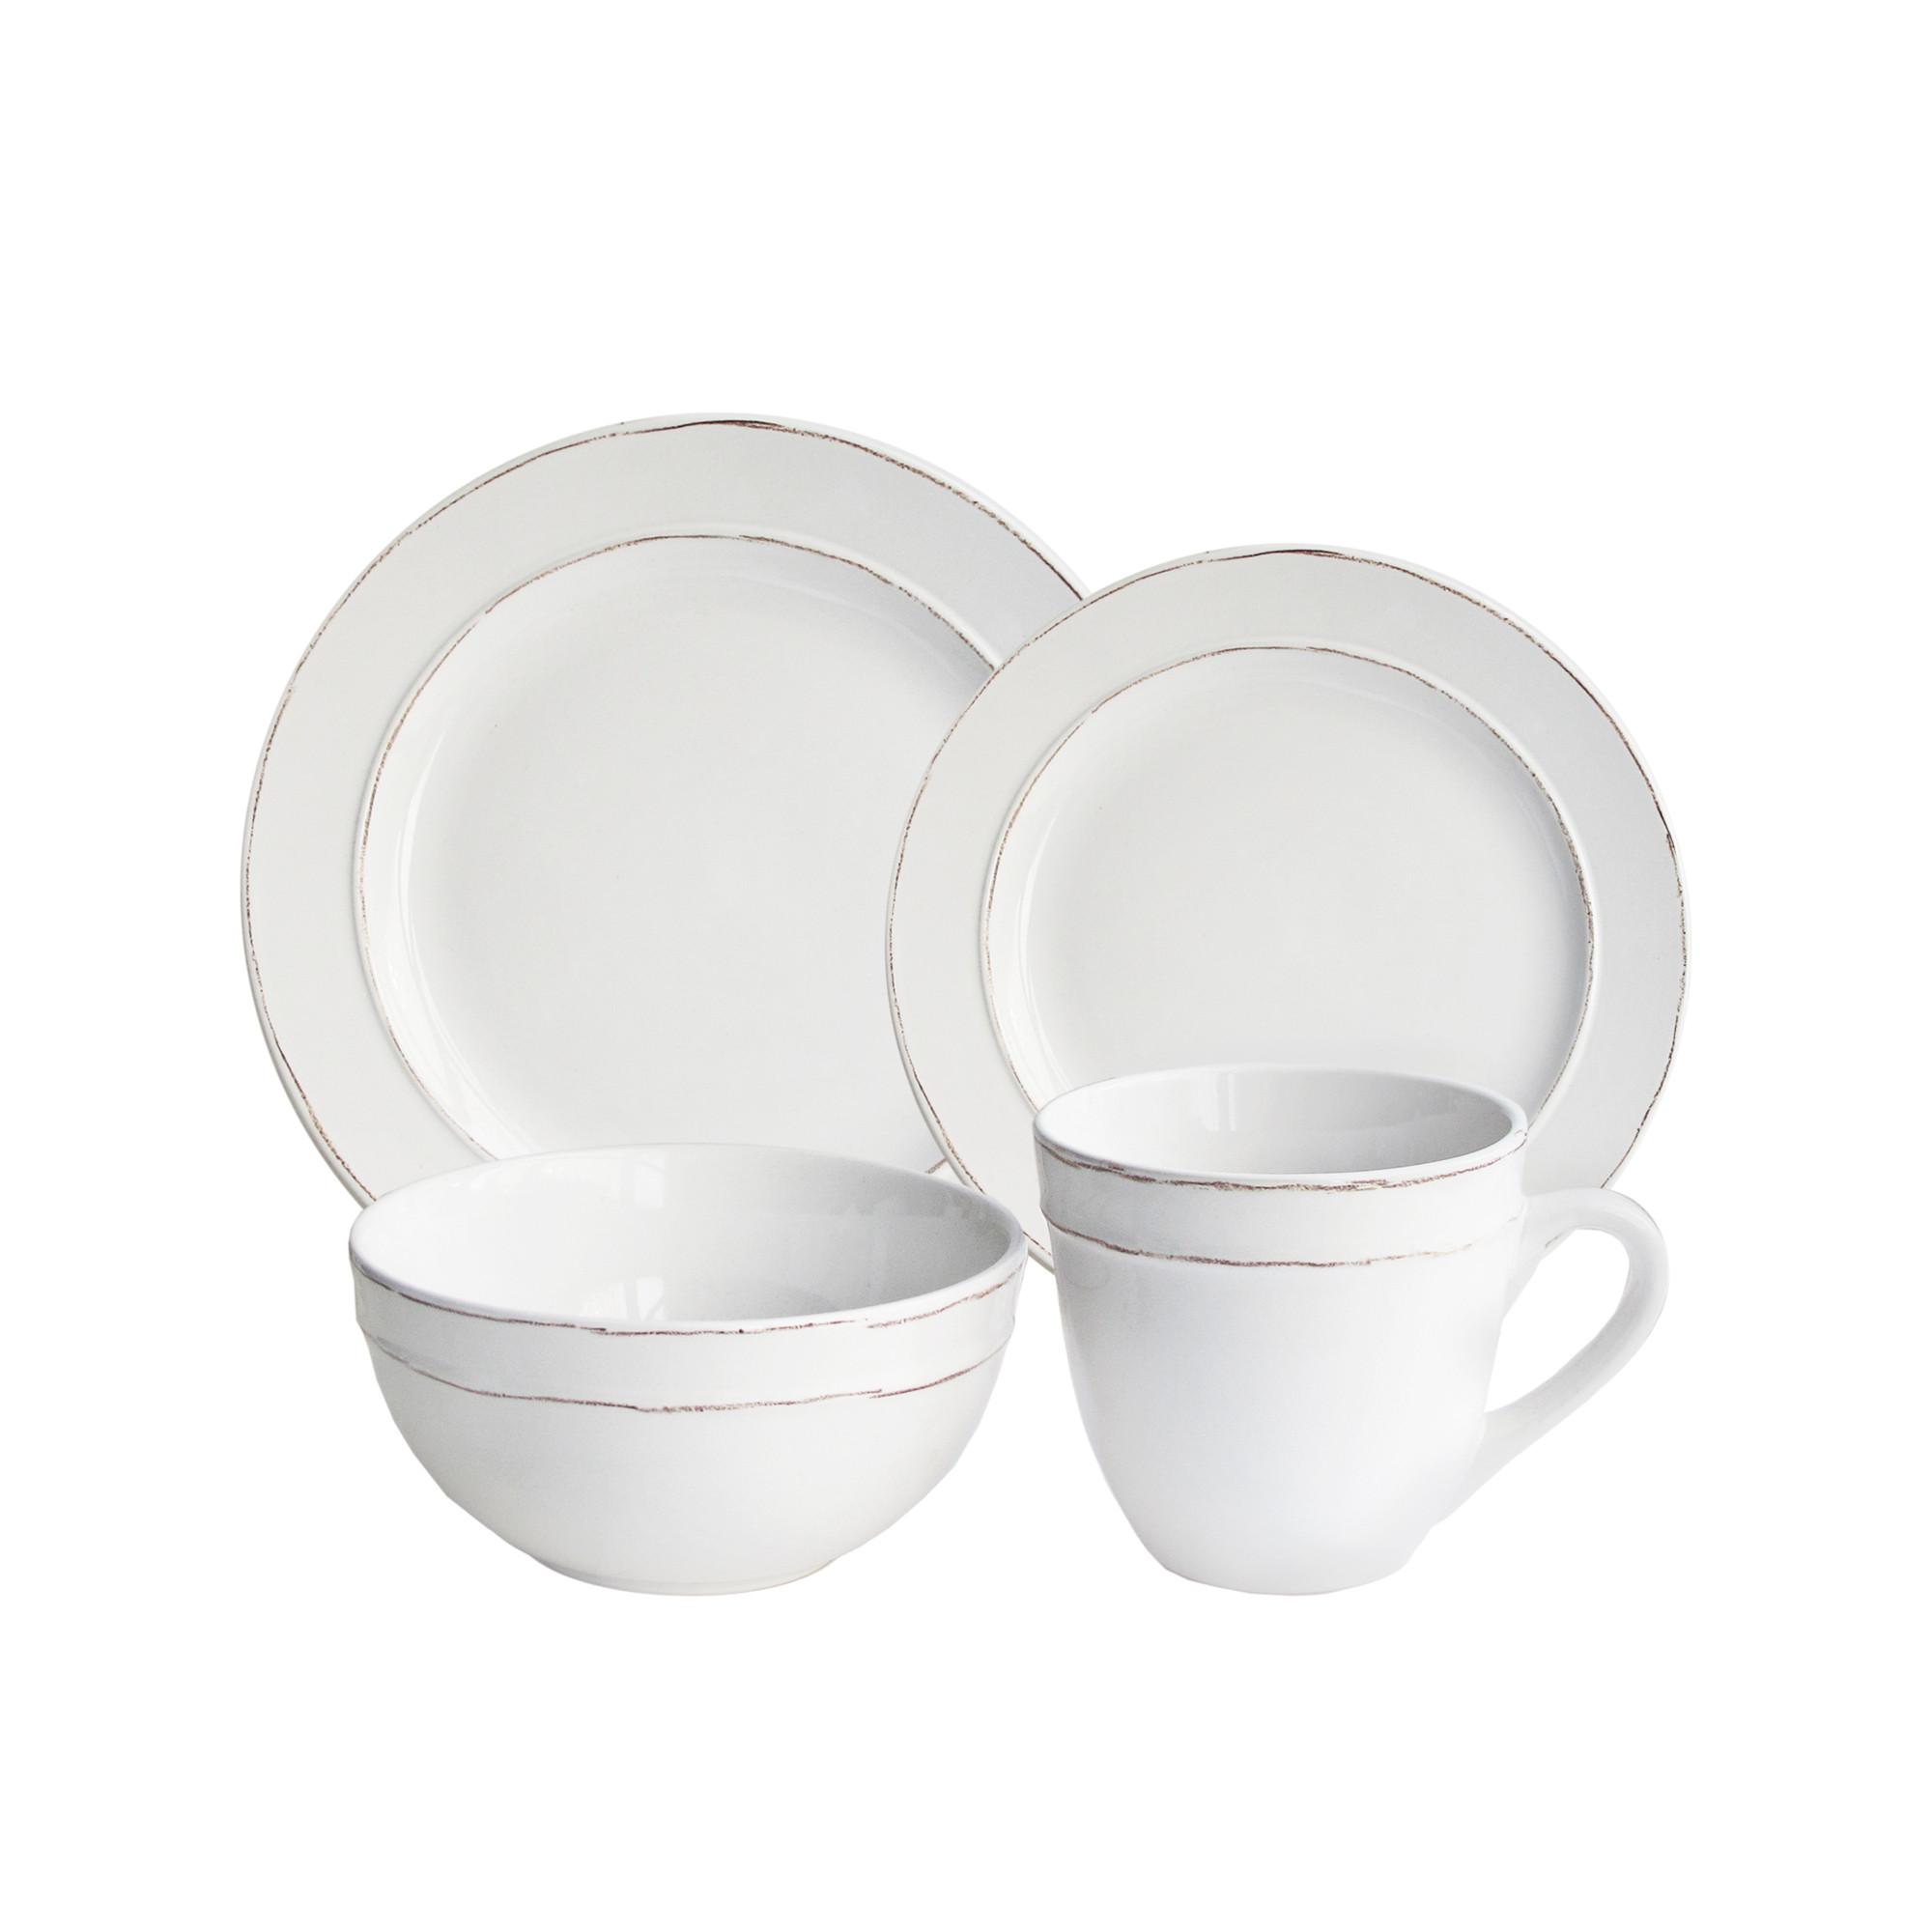 American Atelier Olivia 16 Piece Dinnerware Set